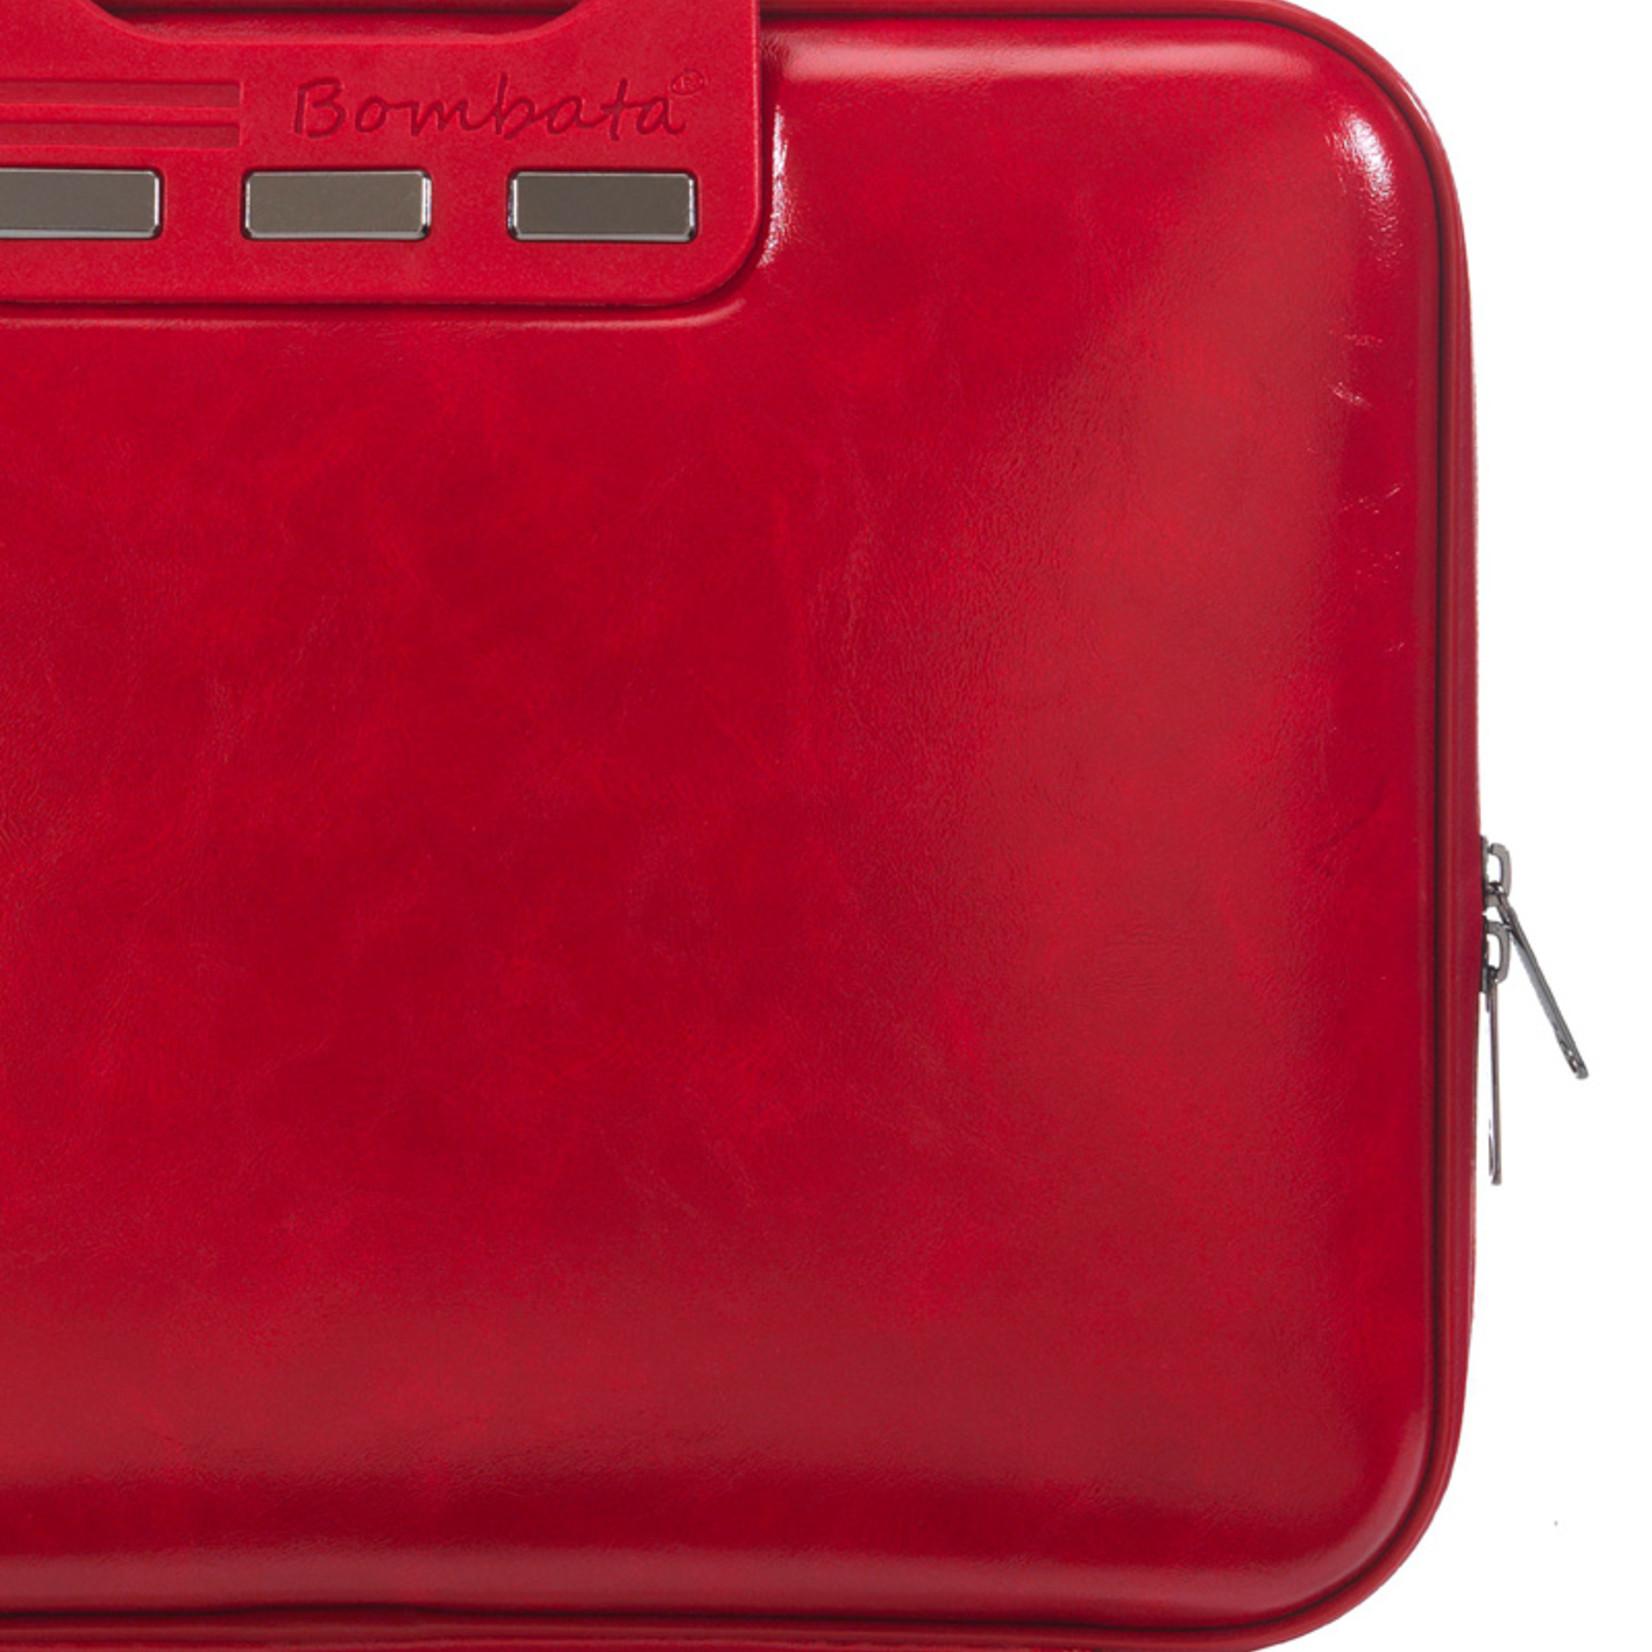 "Bombata Taschen Laptoptasche 13"" | Mediobombata Evolution | rot"